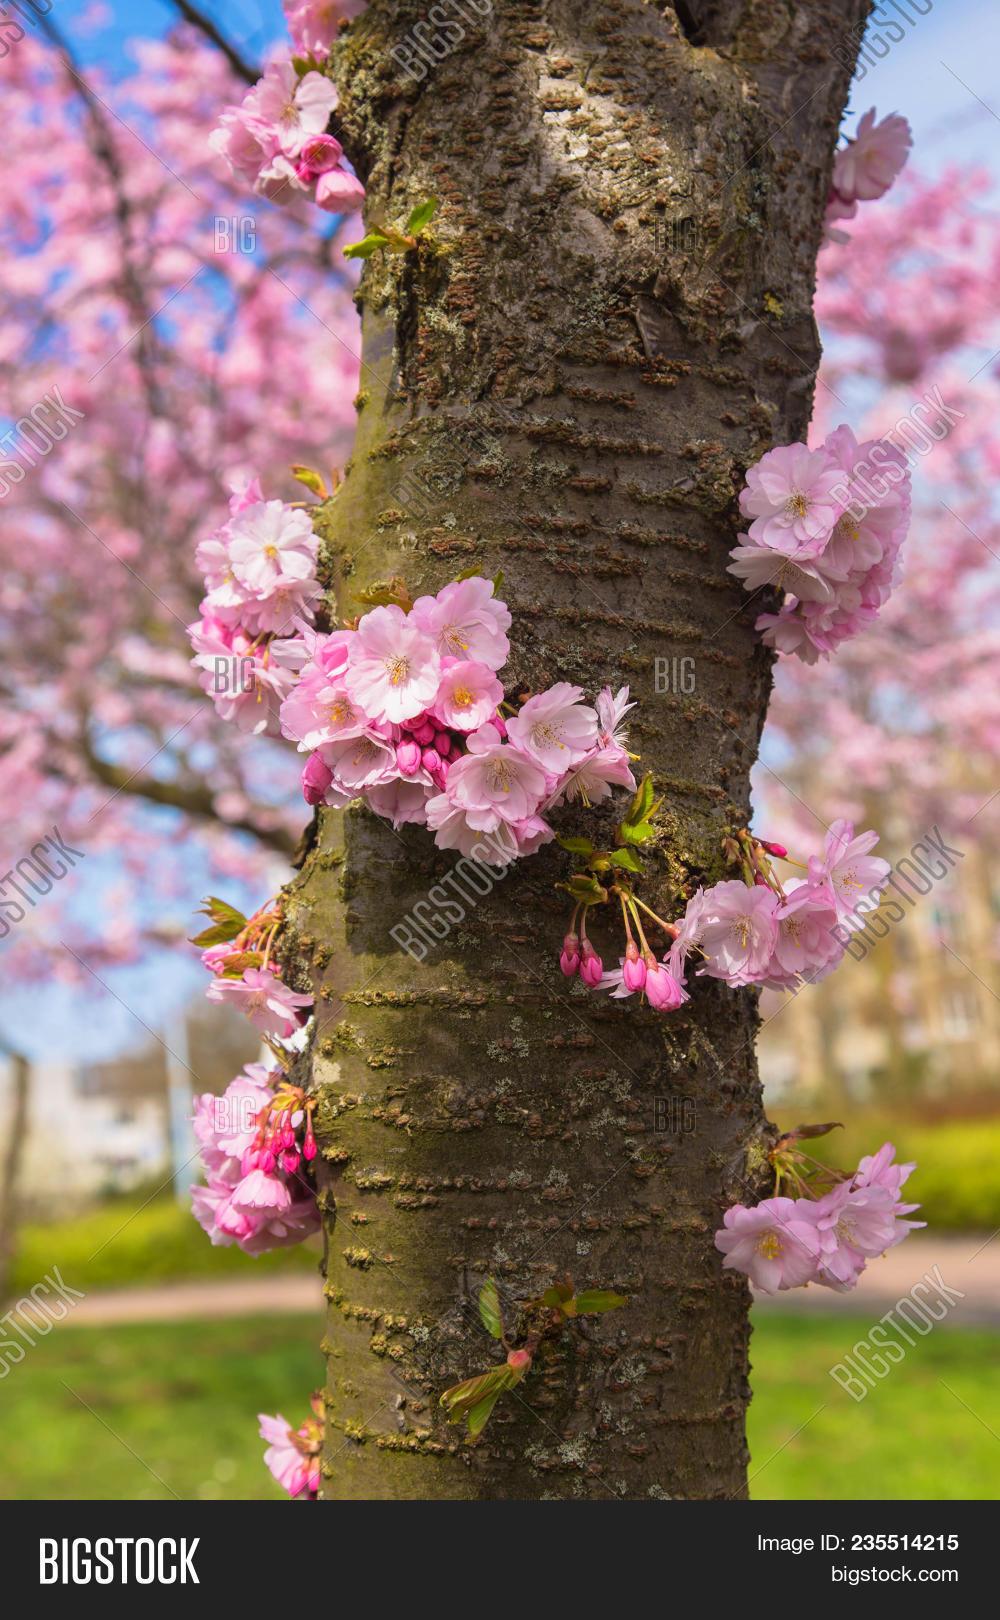 Blooming cherry tree image photo free trial bigstock blooming cherry tree trunk beautiful spring pink sakura cherry flowers floral spring background mightylinksfo